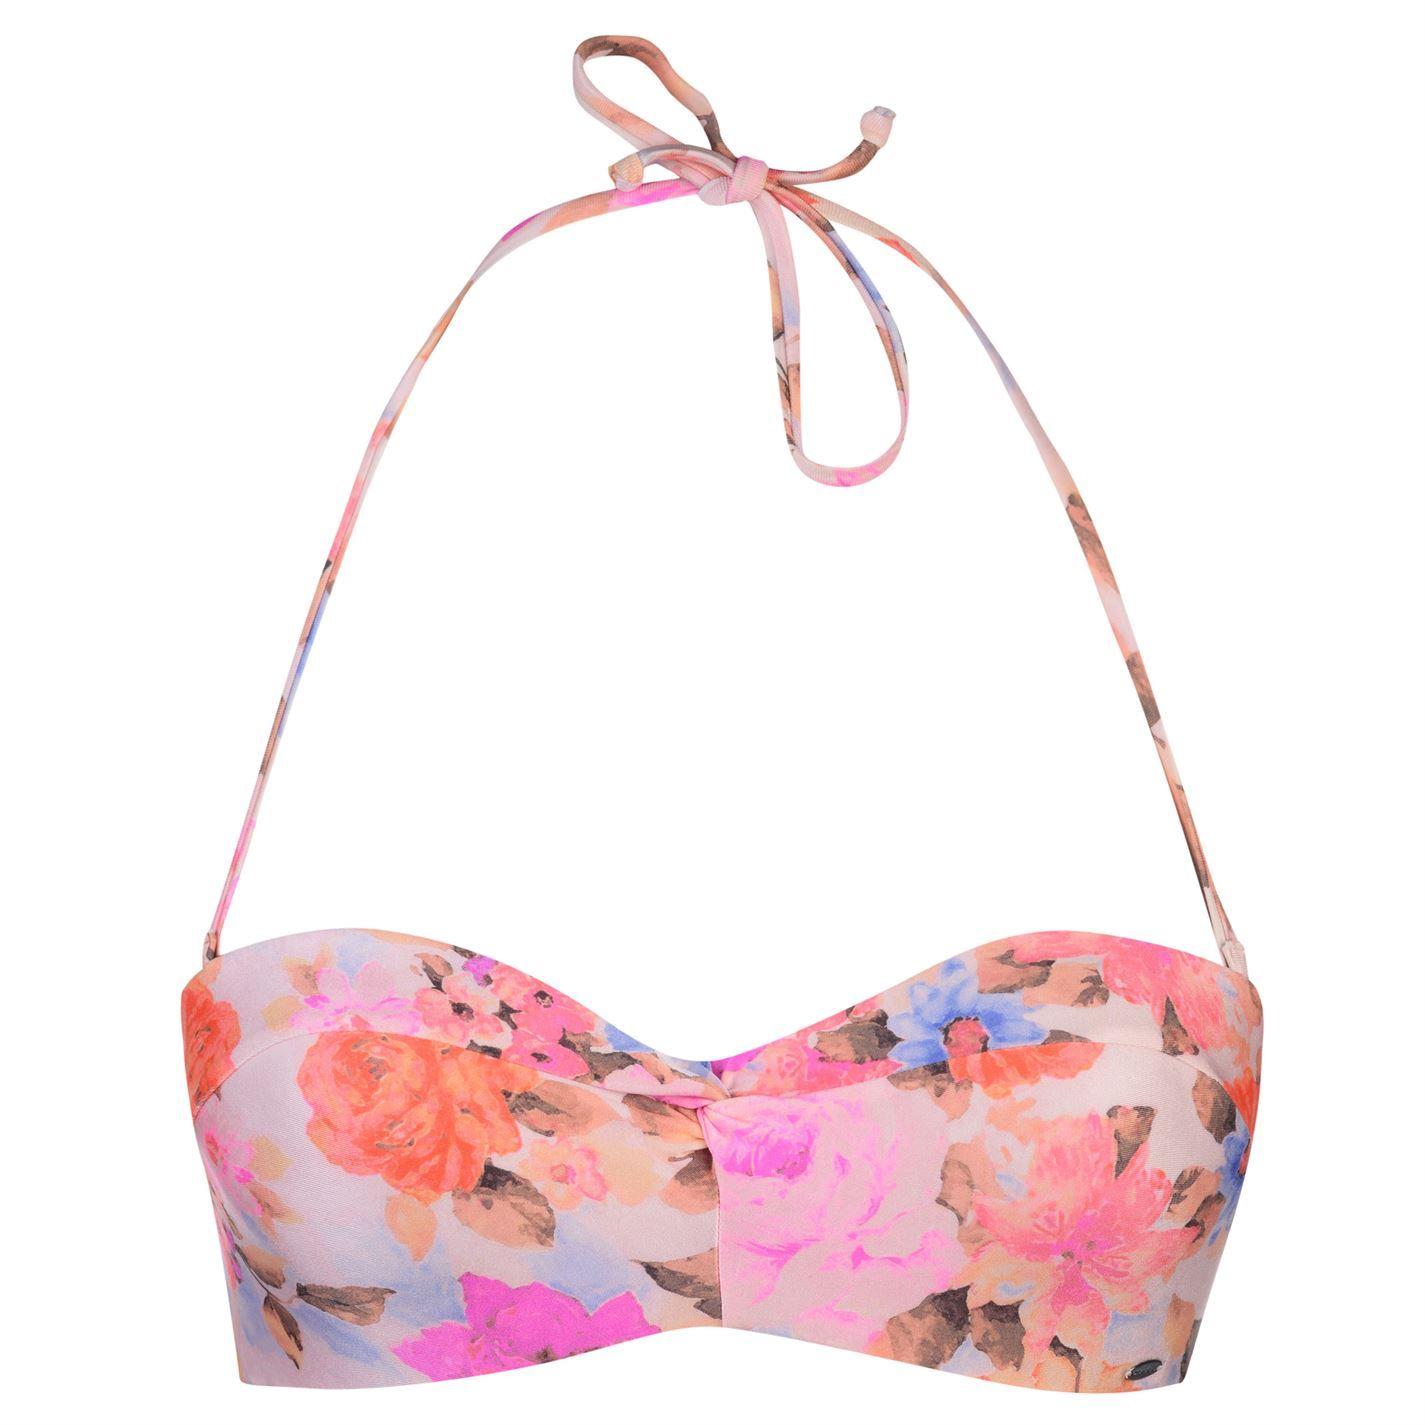 ONeill-Womens-Festival-Padded-Bandeau-Bikini-Top-Pattern-Floral